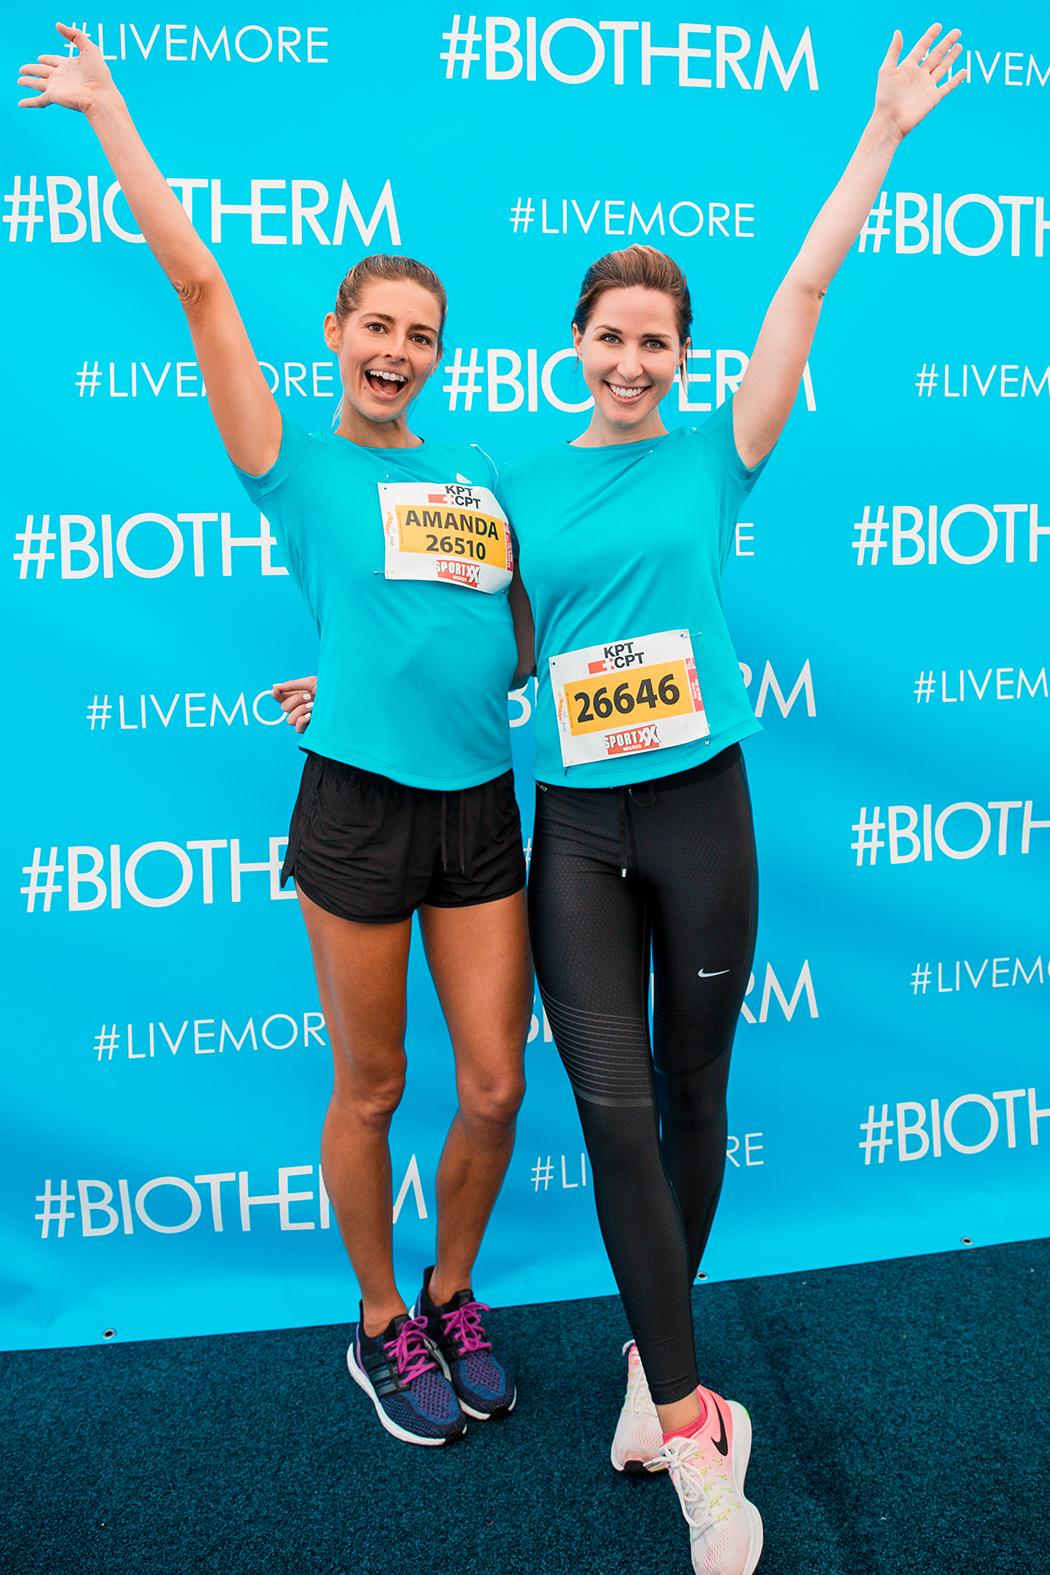 Fitnessblog-Fitnessblogger-Fitness-Blog-Blogger-Frauenlauf-Bern-Biotherm-livemore-14-web